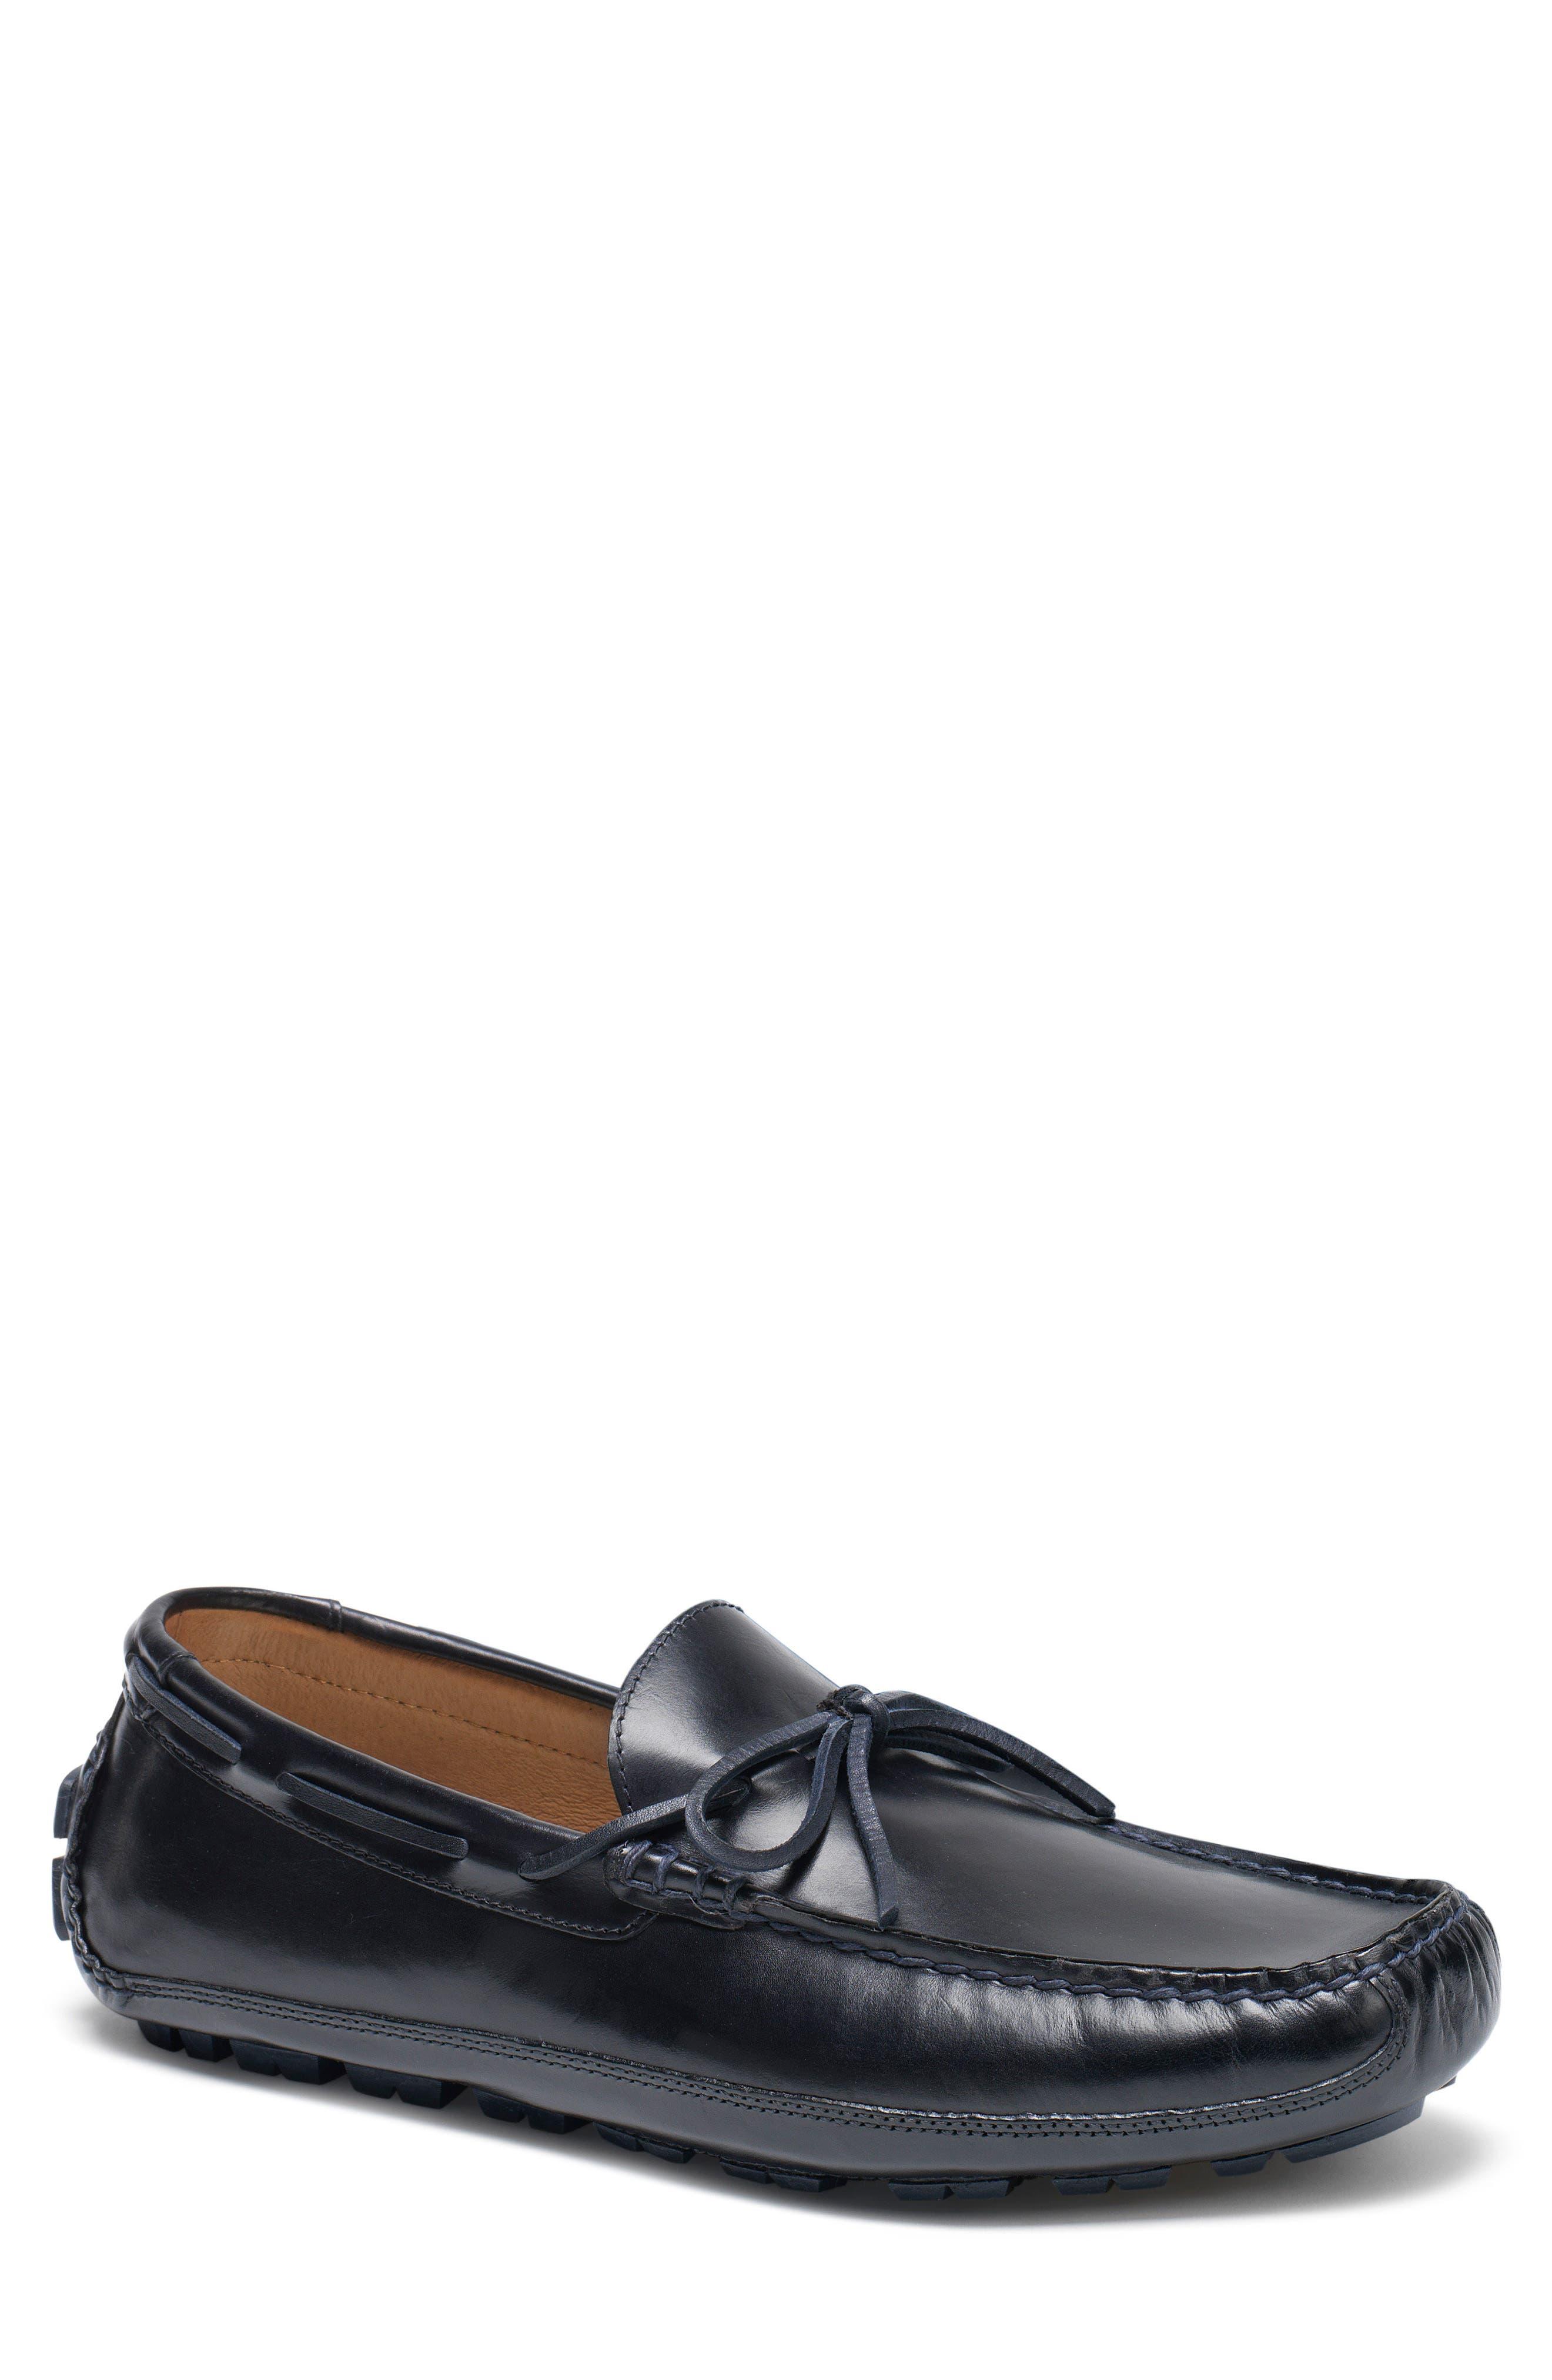 Main Image - Trask Dillion Driving Loafer (Men)